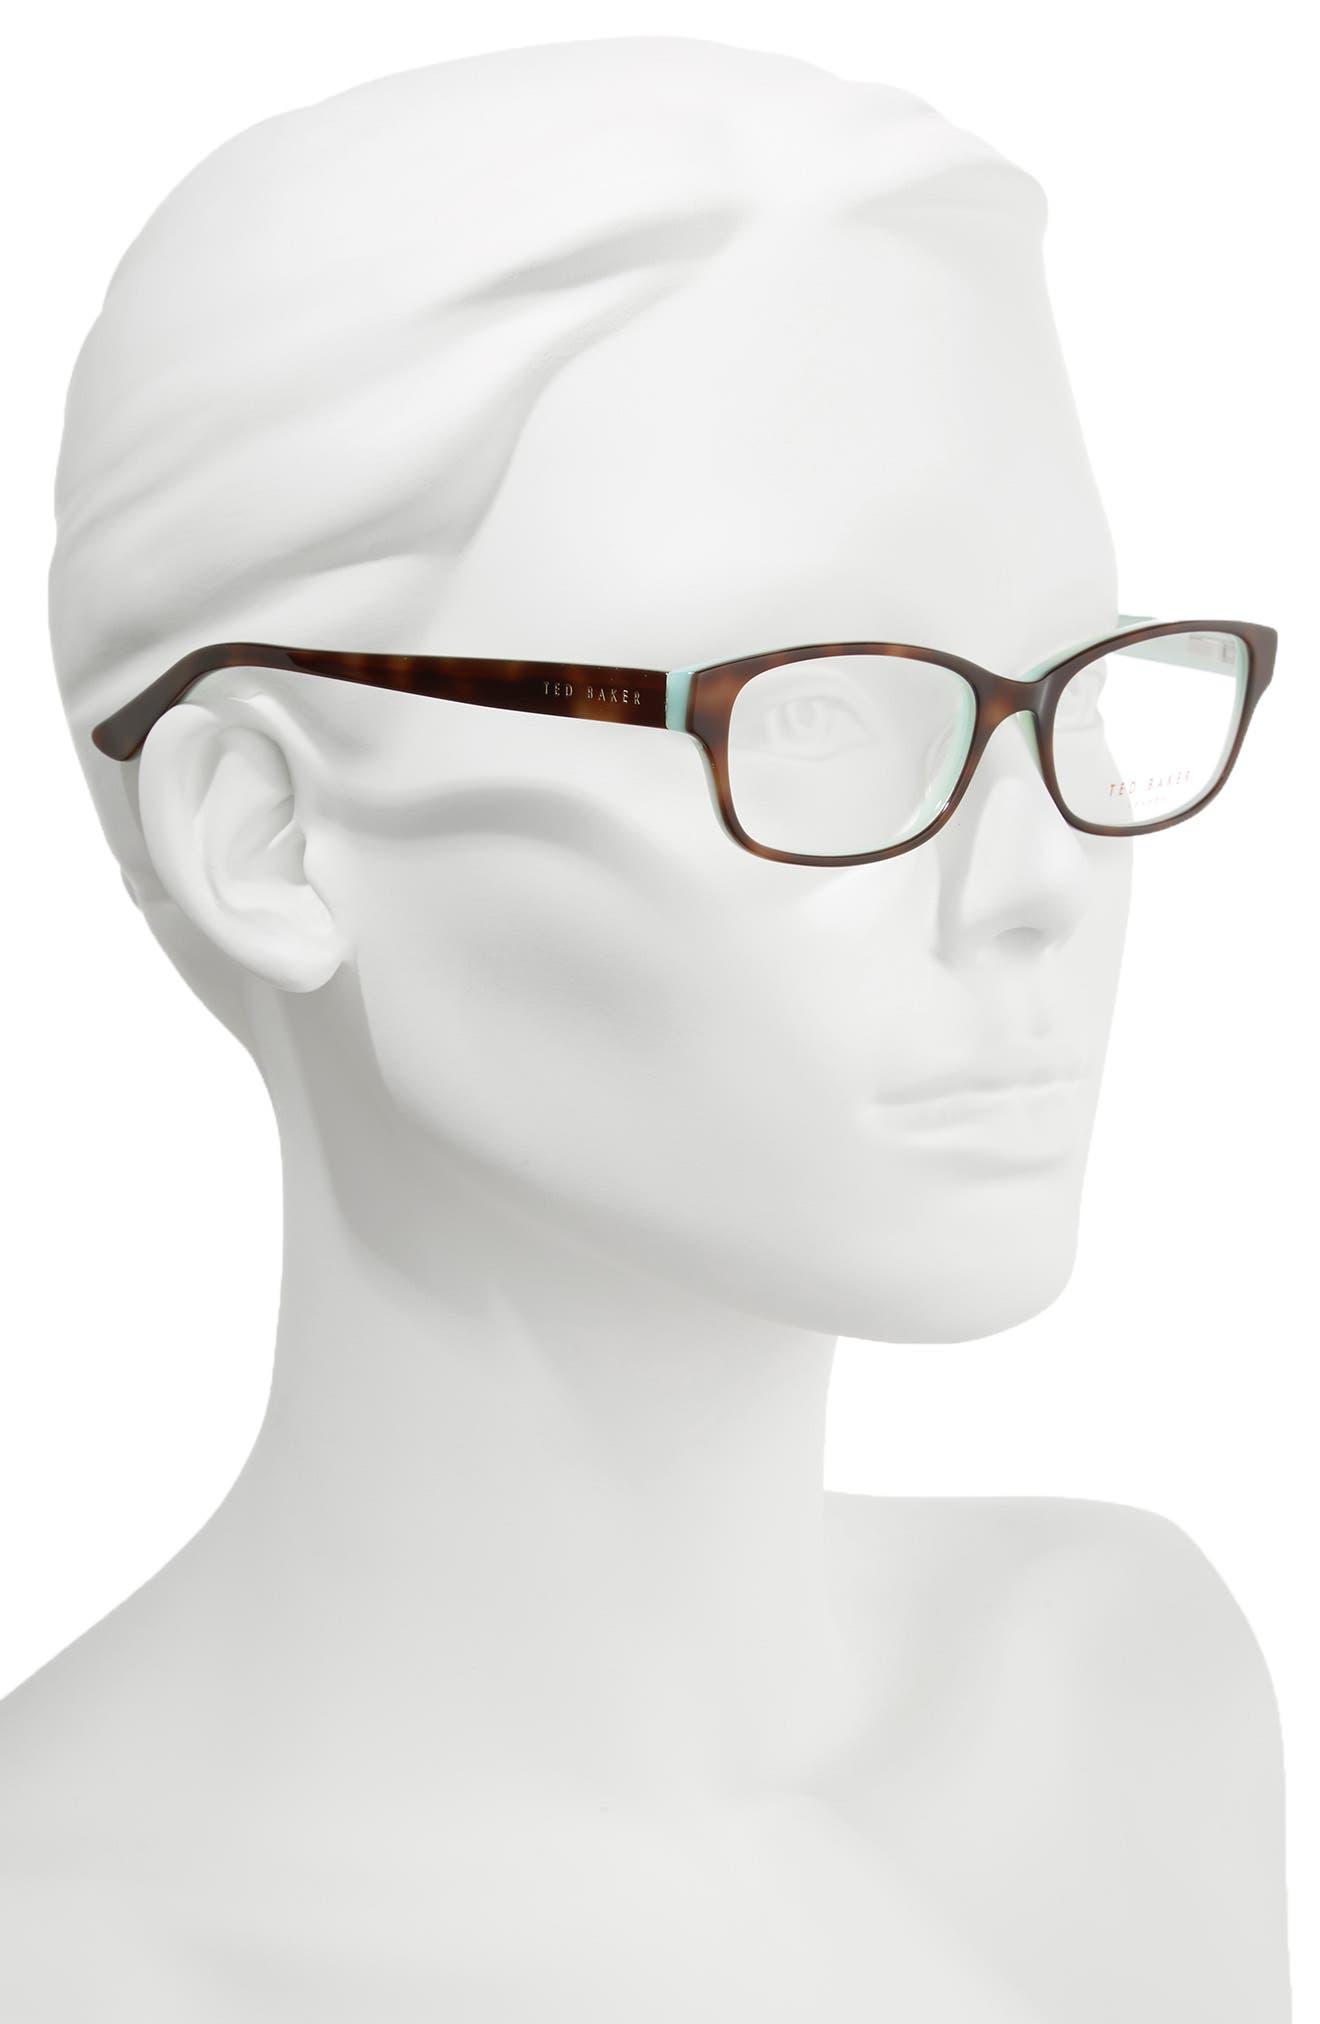 53mm Optical Glasses,                             Alternate thumbnail 2, color,                             200